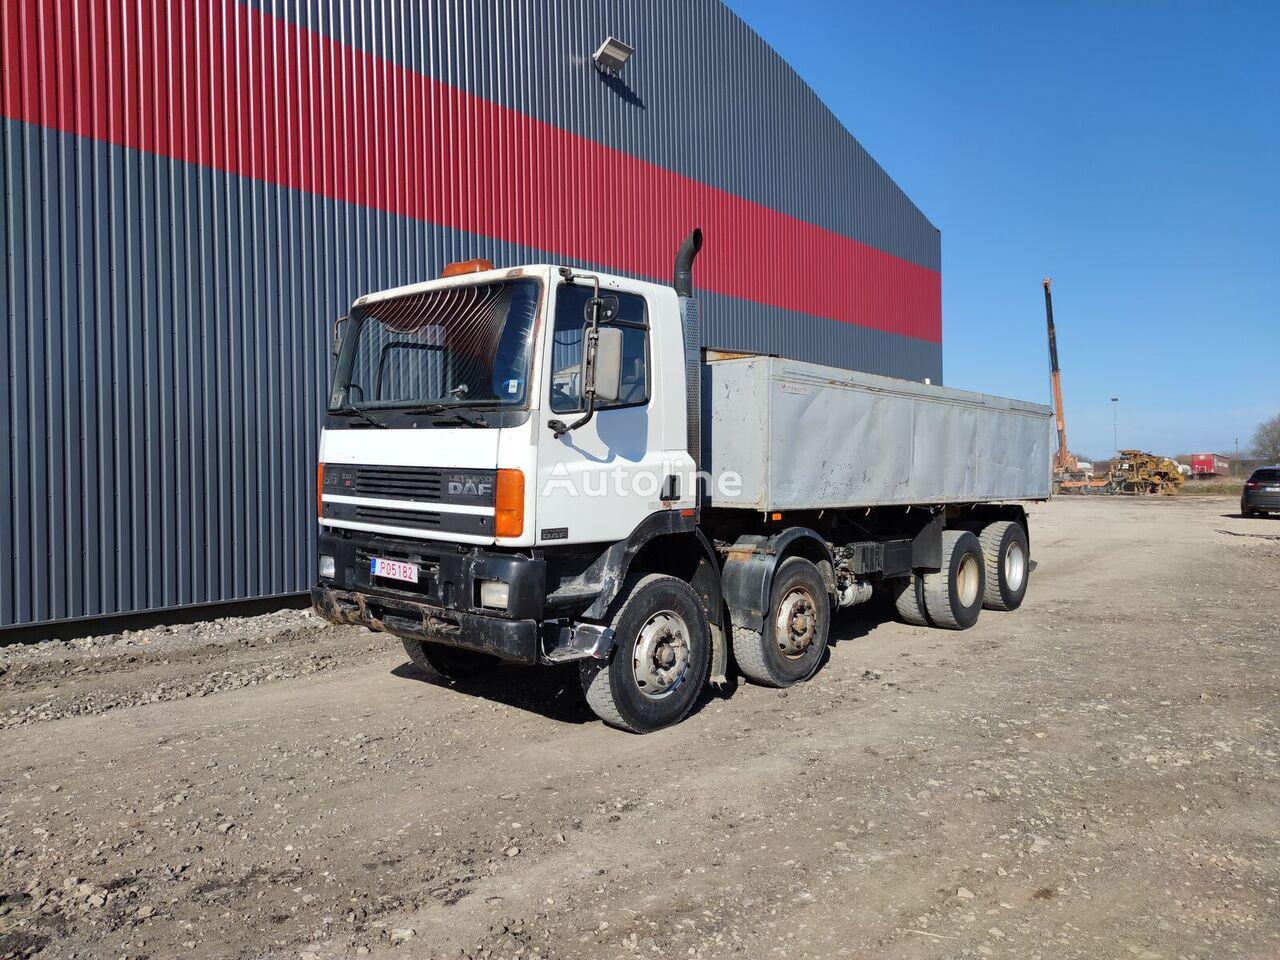 DAF 85.330, 8x4 dump truck